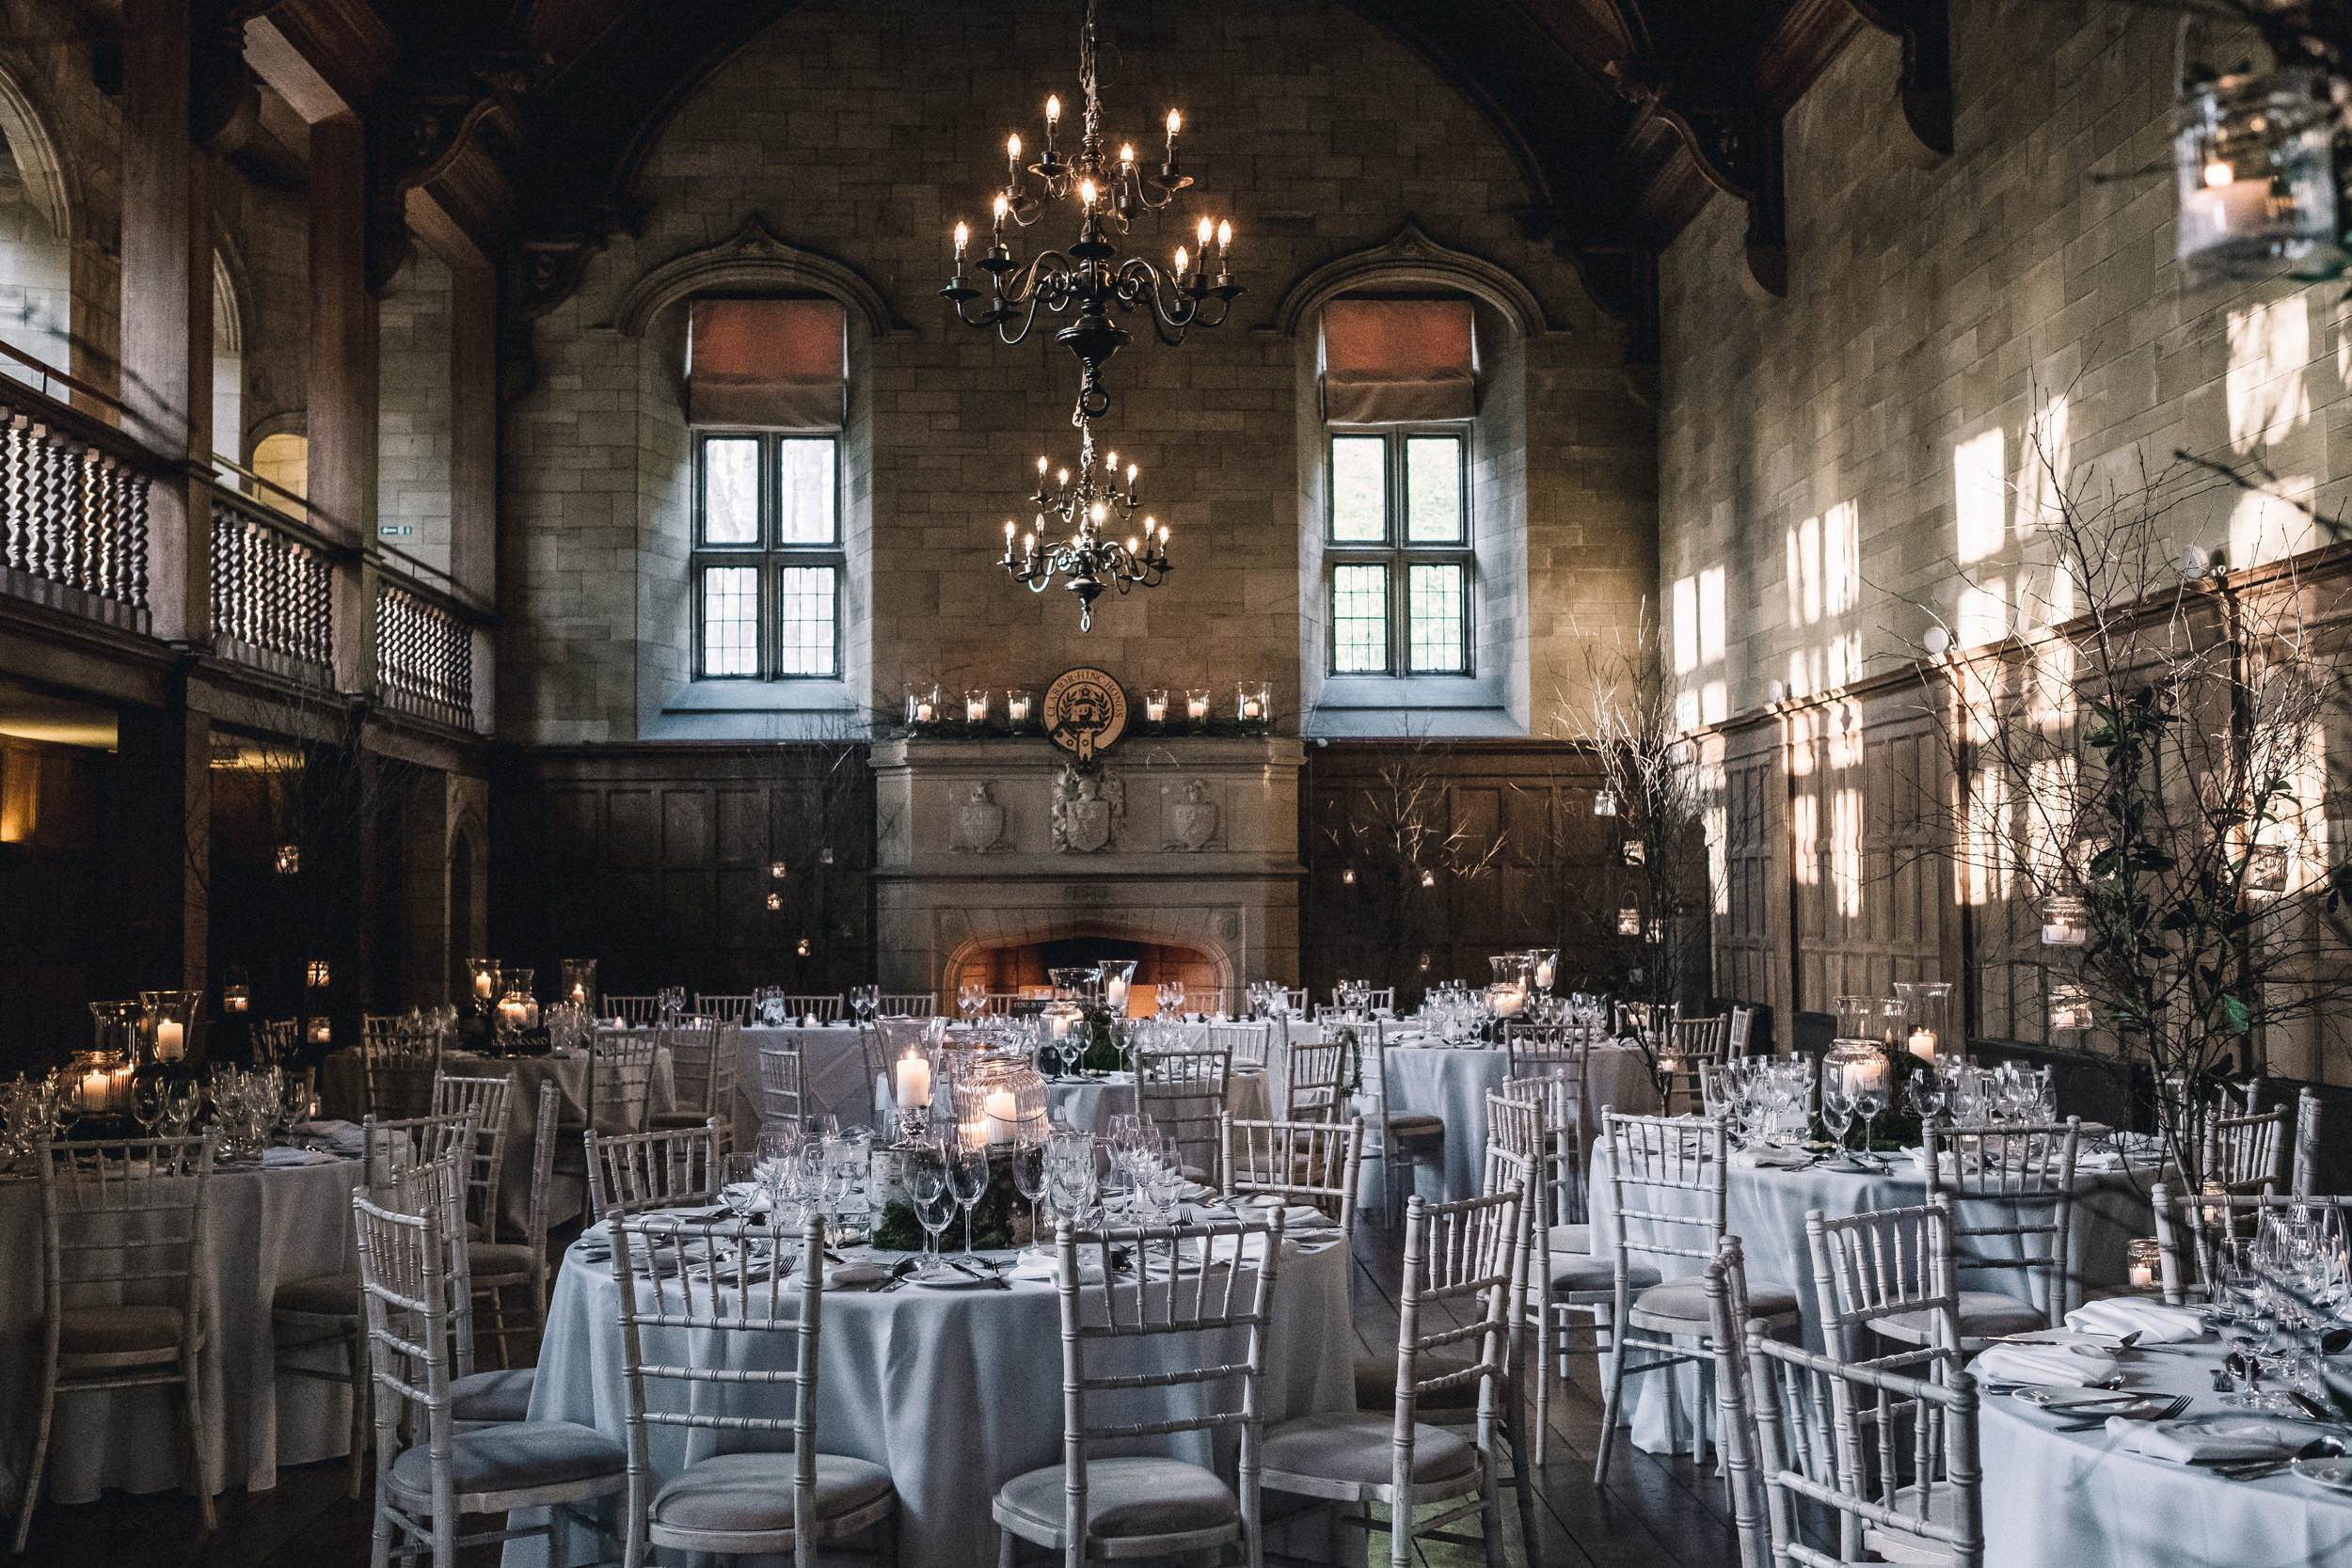 Achnagairn Estate ballroom prepared for wedding breakfast